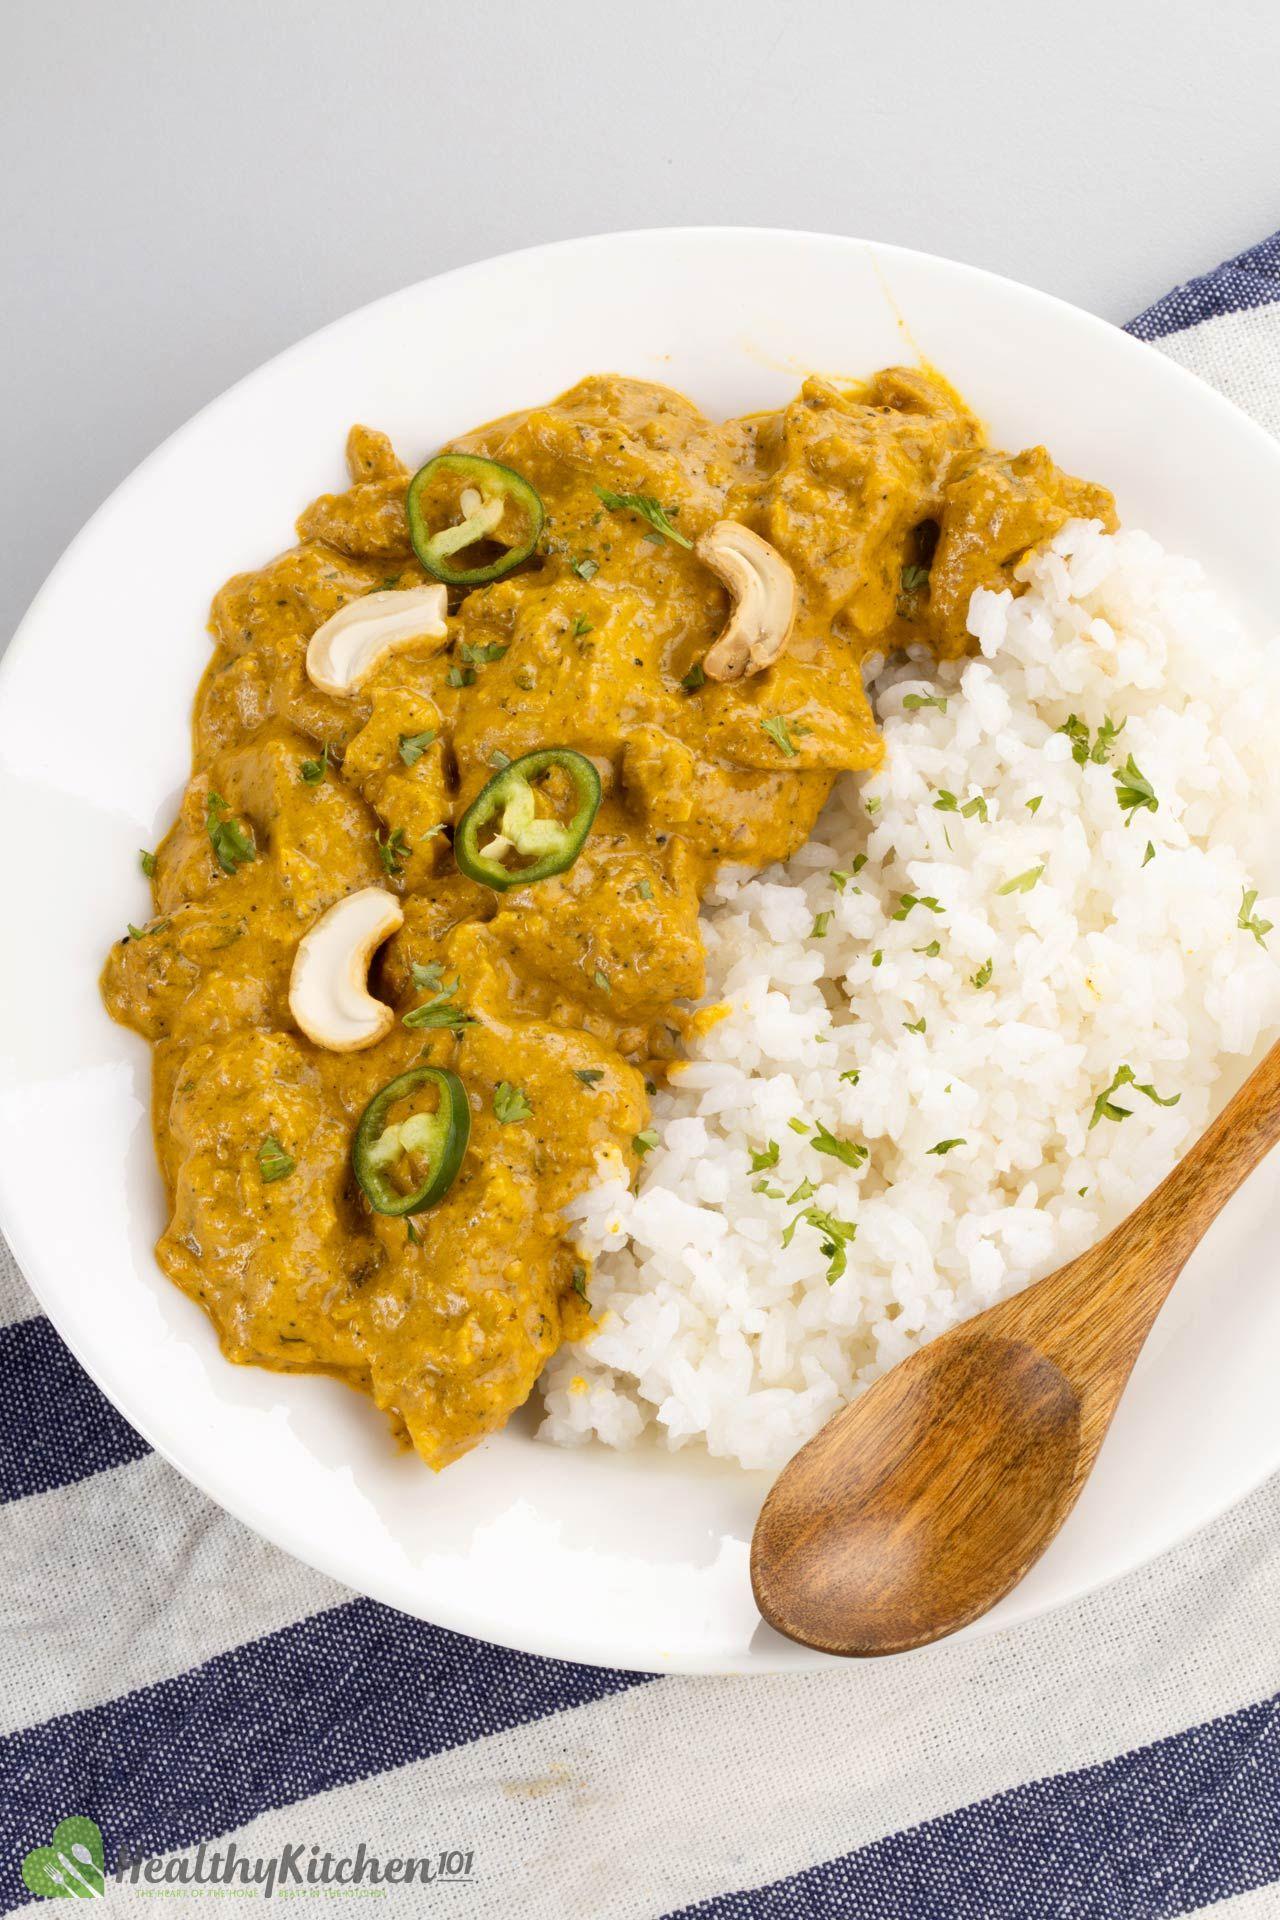 Is Chicken Korma Spicy?